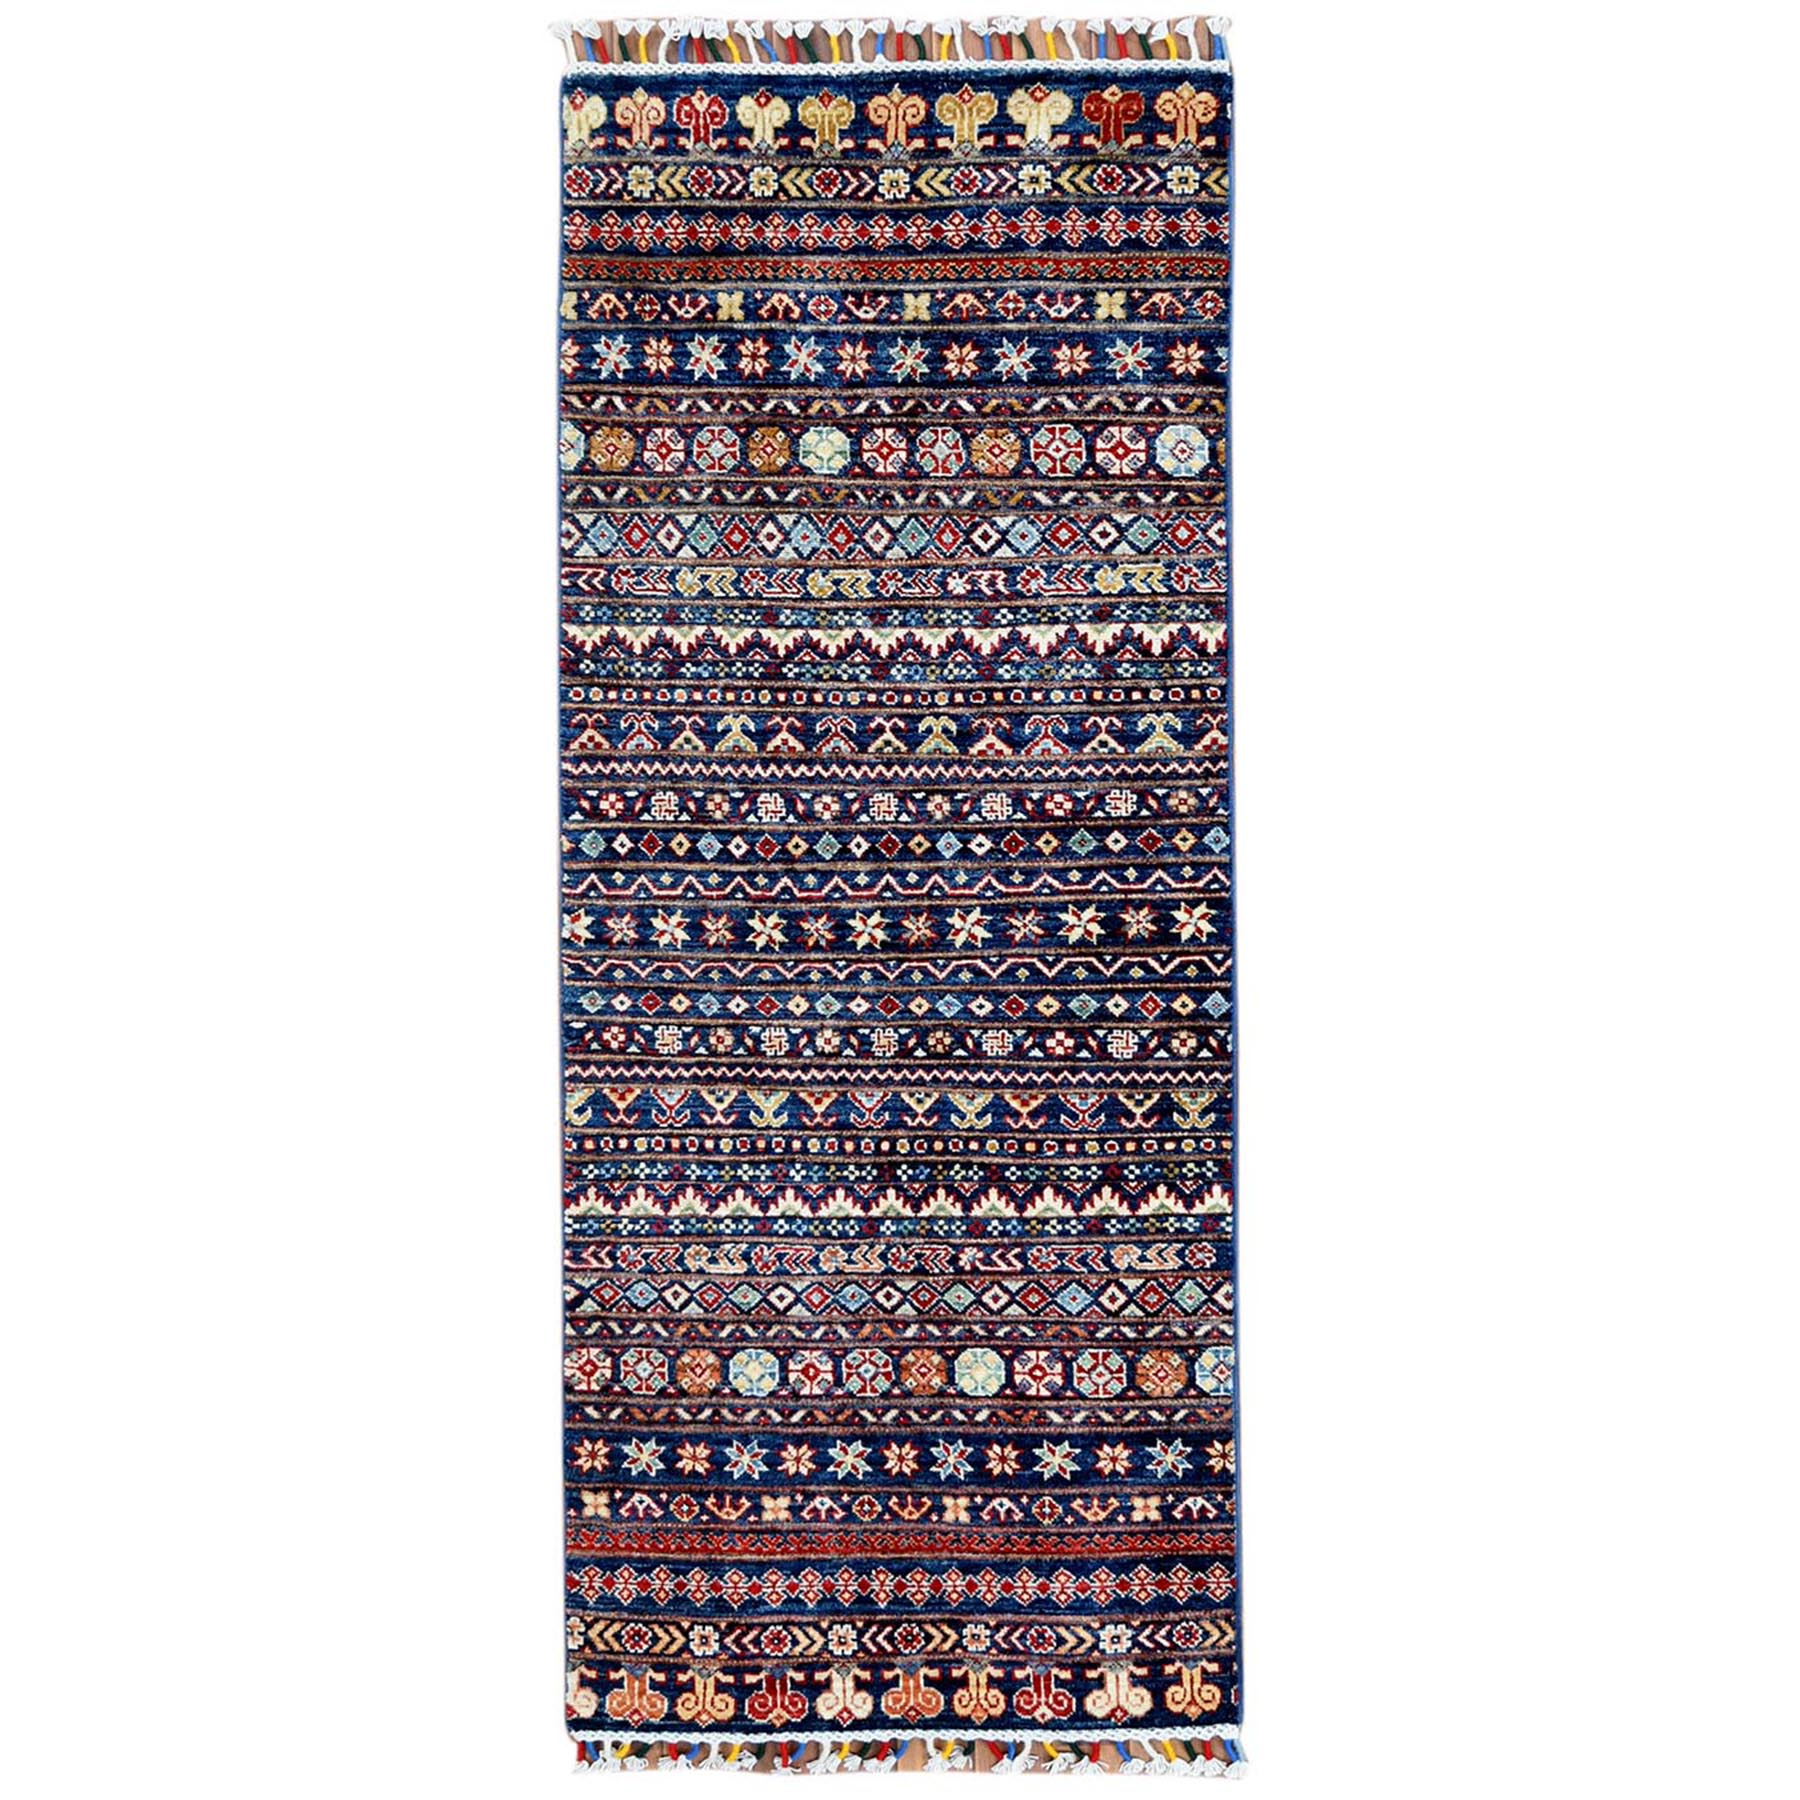 "2'7""X6'5"" Organic Wool Navy Blue With Colorful Tassels Hand Knotted Super Kazak Khorjin Design Oriental Runner Rug moa60bc0"